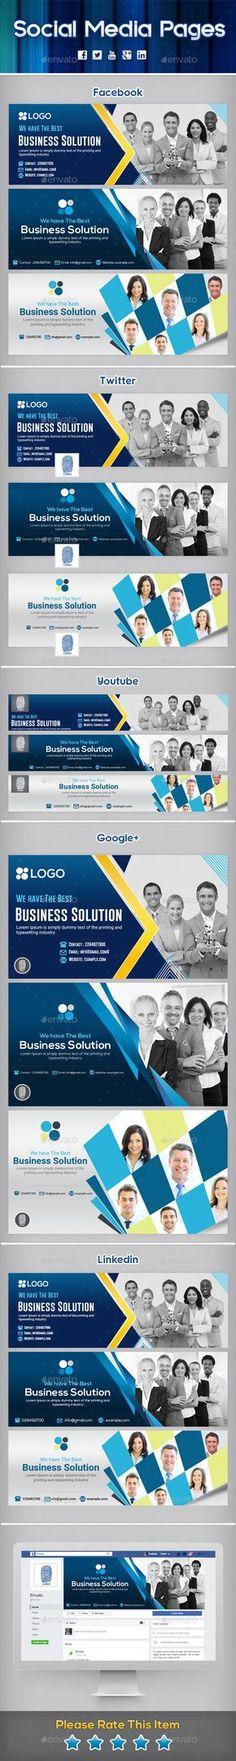 Multi Purpose Social Media Pages Design Templates PSD